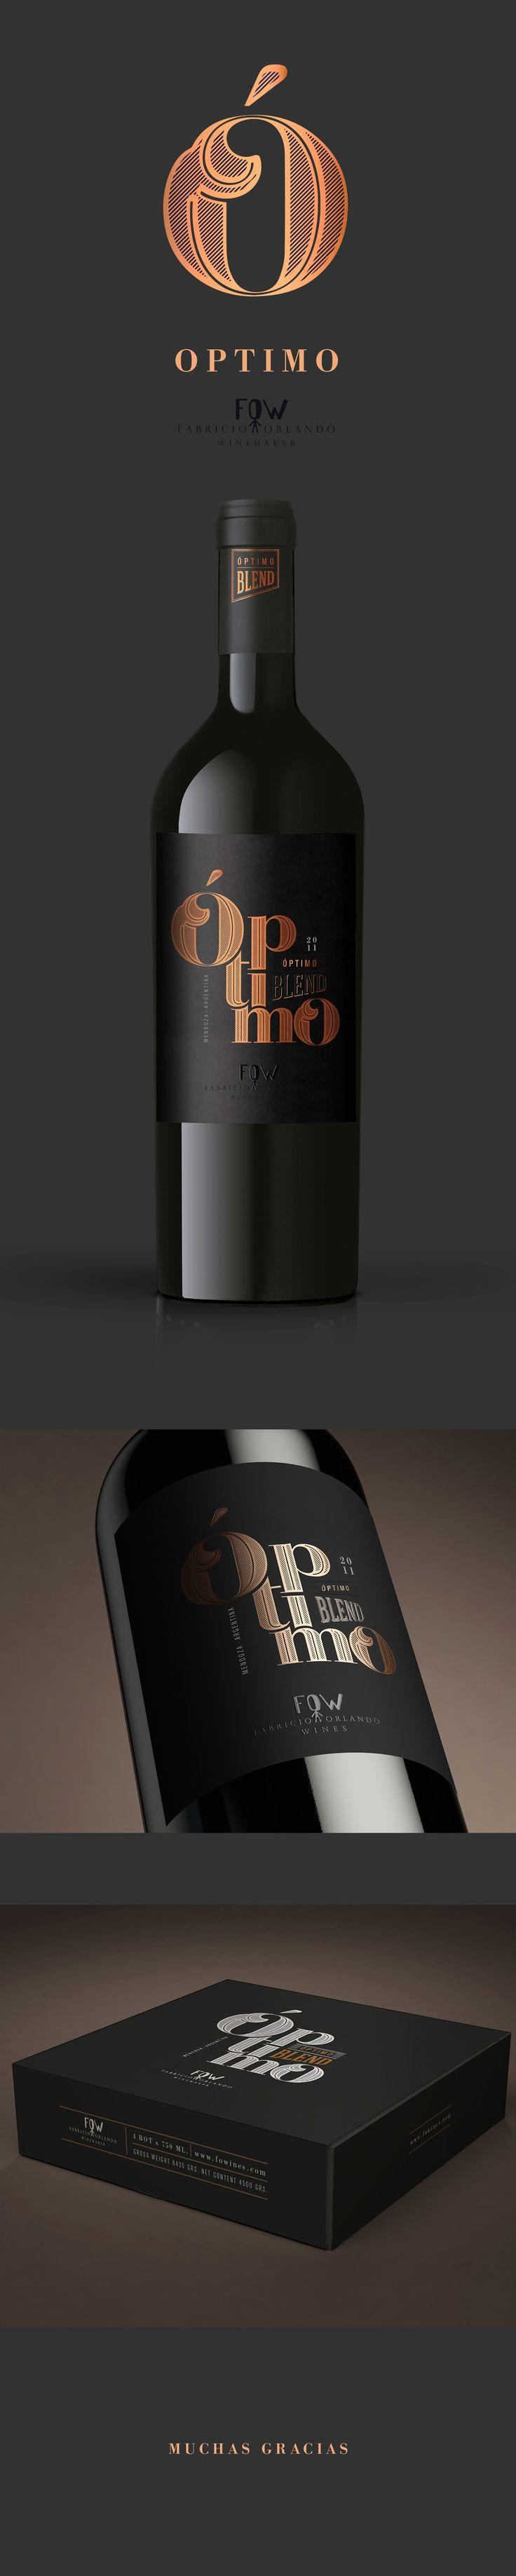 Diseño de packaging para Fabricio Orlando Winemaker, Optimo Blend